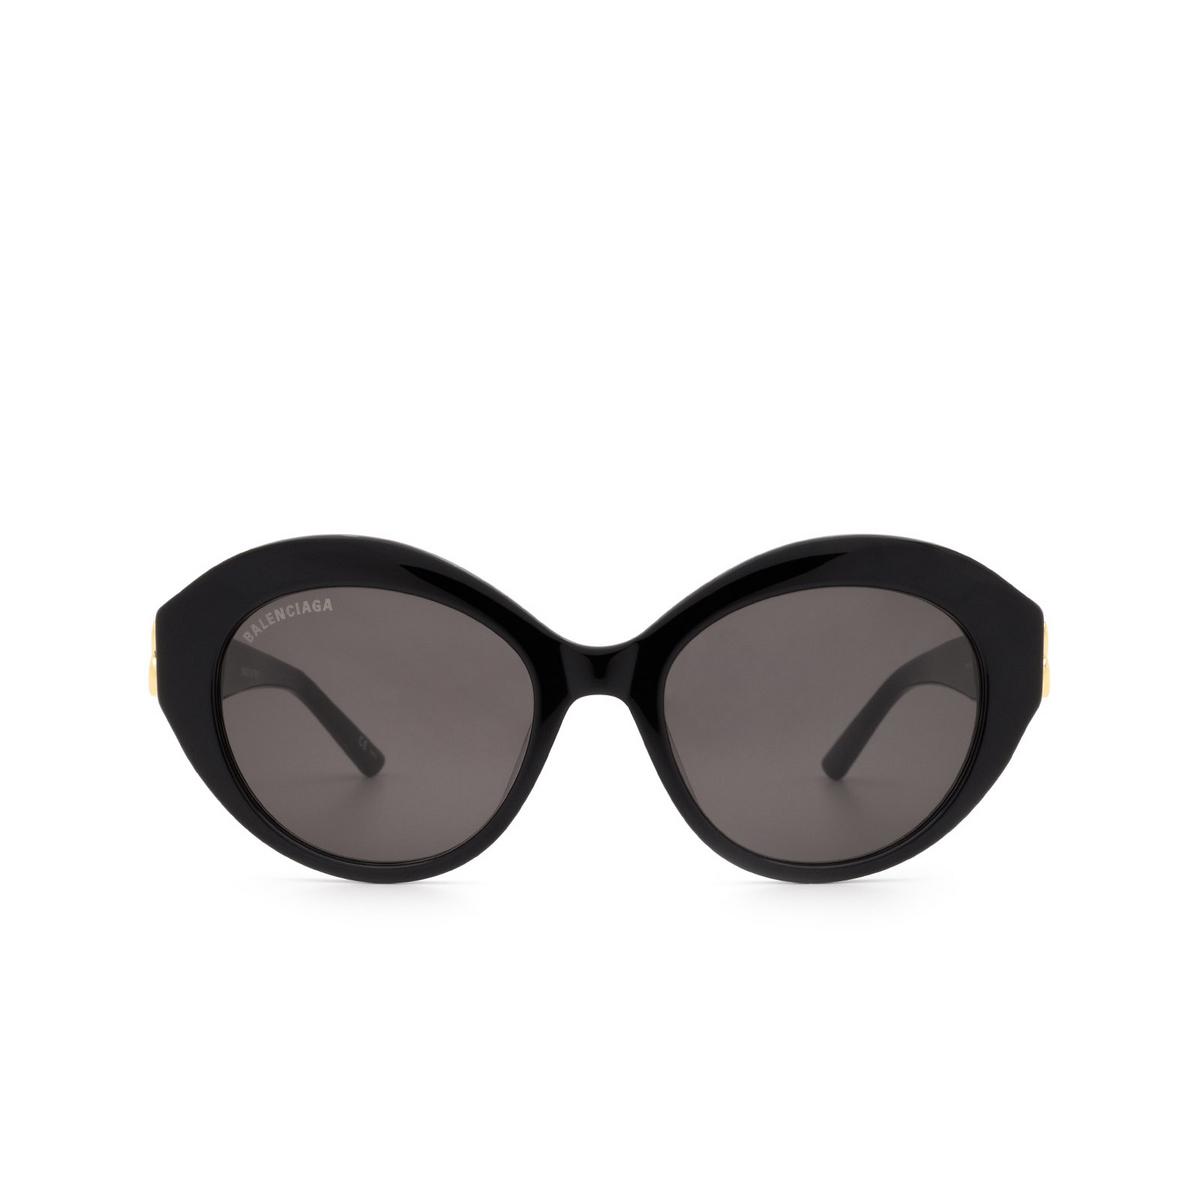 Balenciaga® Oval Sunglasses: BB0133S color Black 001 - front view.